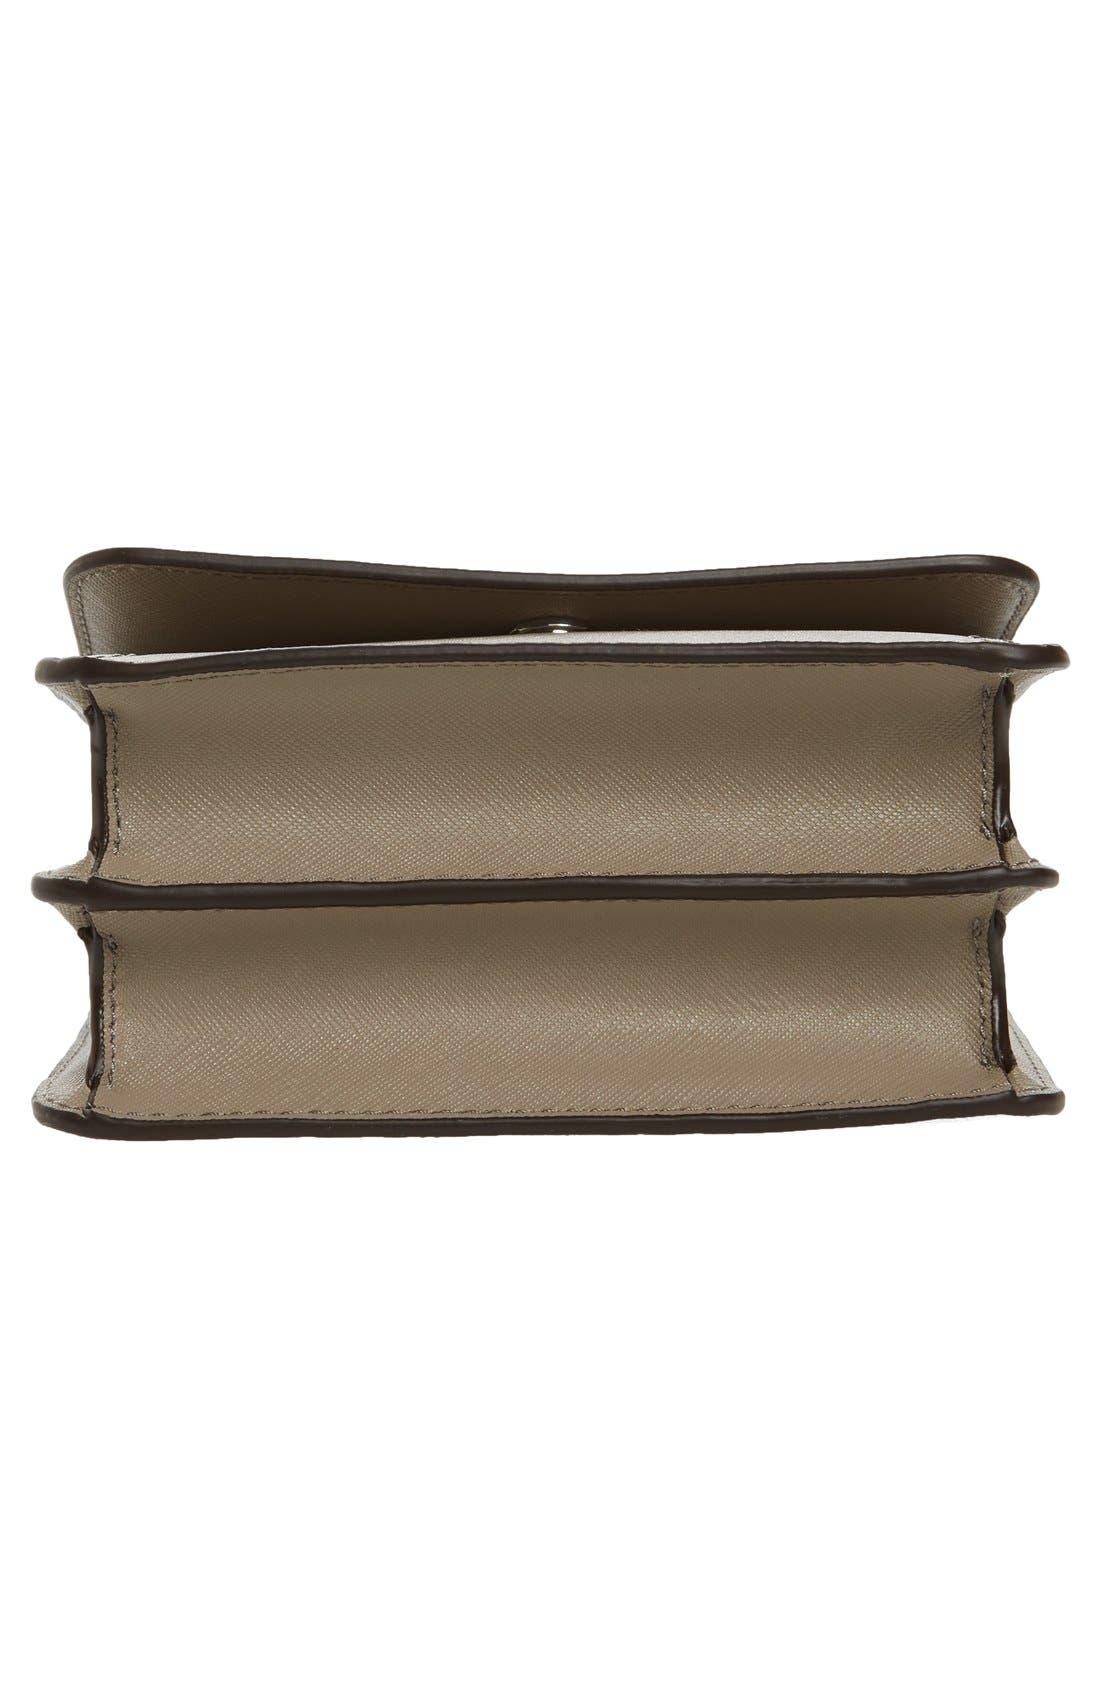 Mini Robinson Convertible Leather Shoulder Bag,                             Alternate thumbnail 3, color,                             036